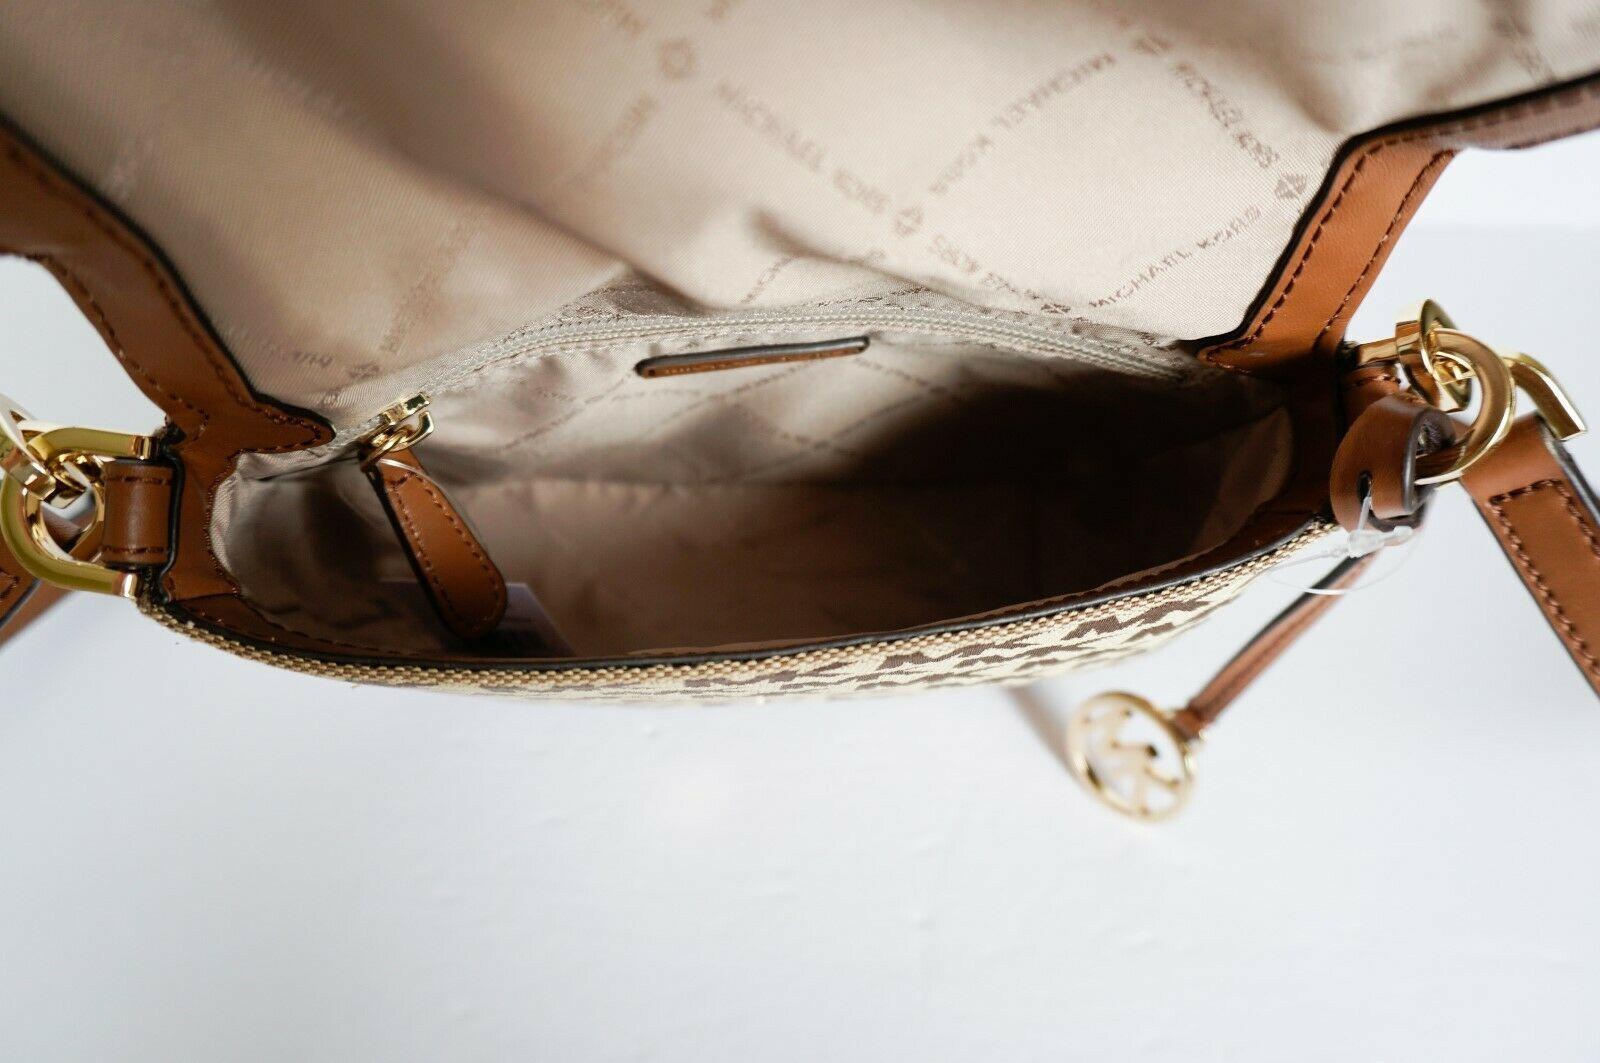 Michael Kors Bedford Small Flap Crossbody Jacquard Leaher Bag MK Beige Brown image 7